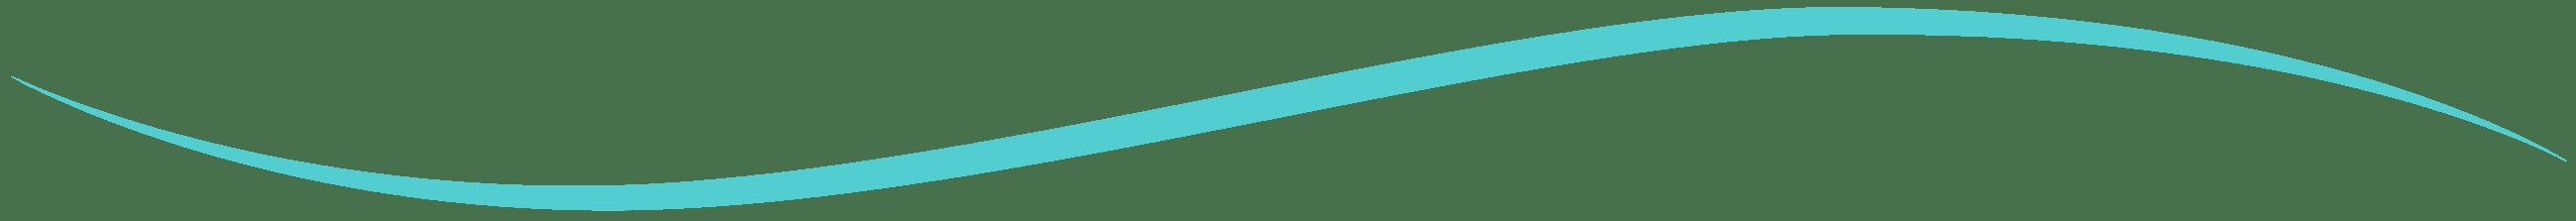 Horizontal Line for separation